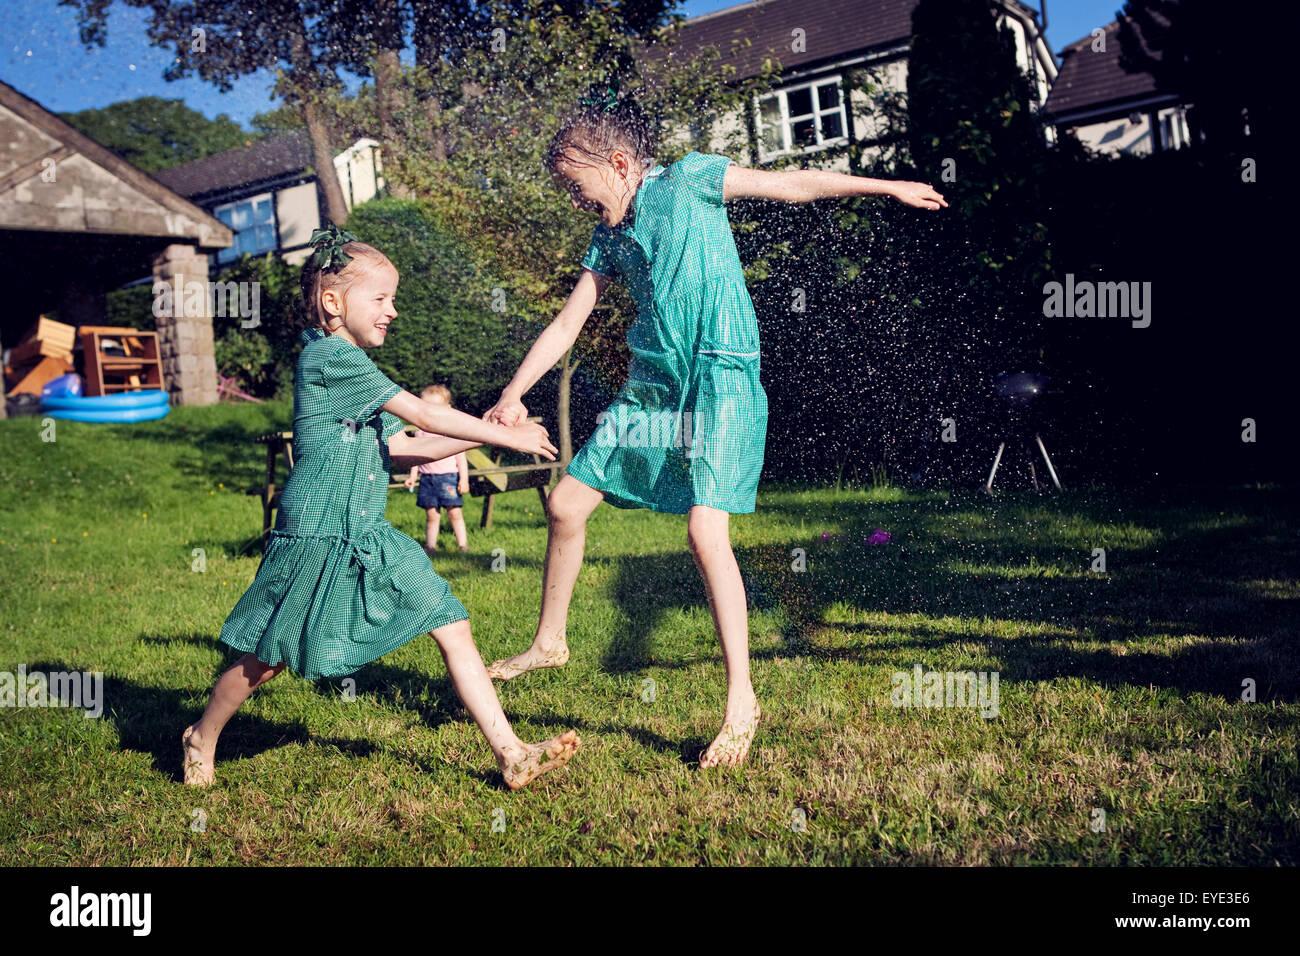 Two children in school summer dresses, running through a water sprinkler. - Stock Image